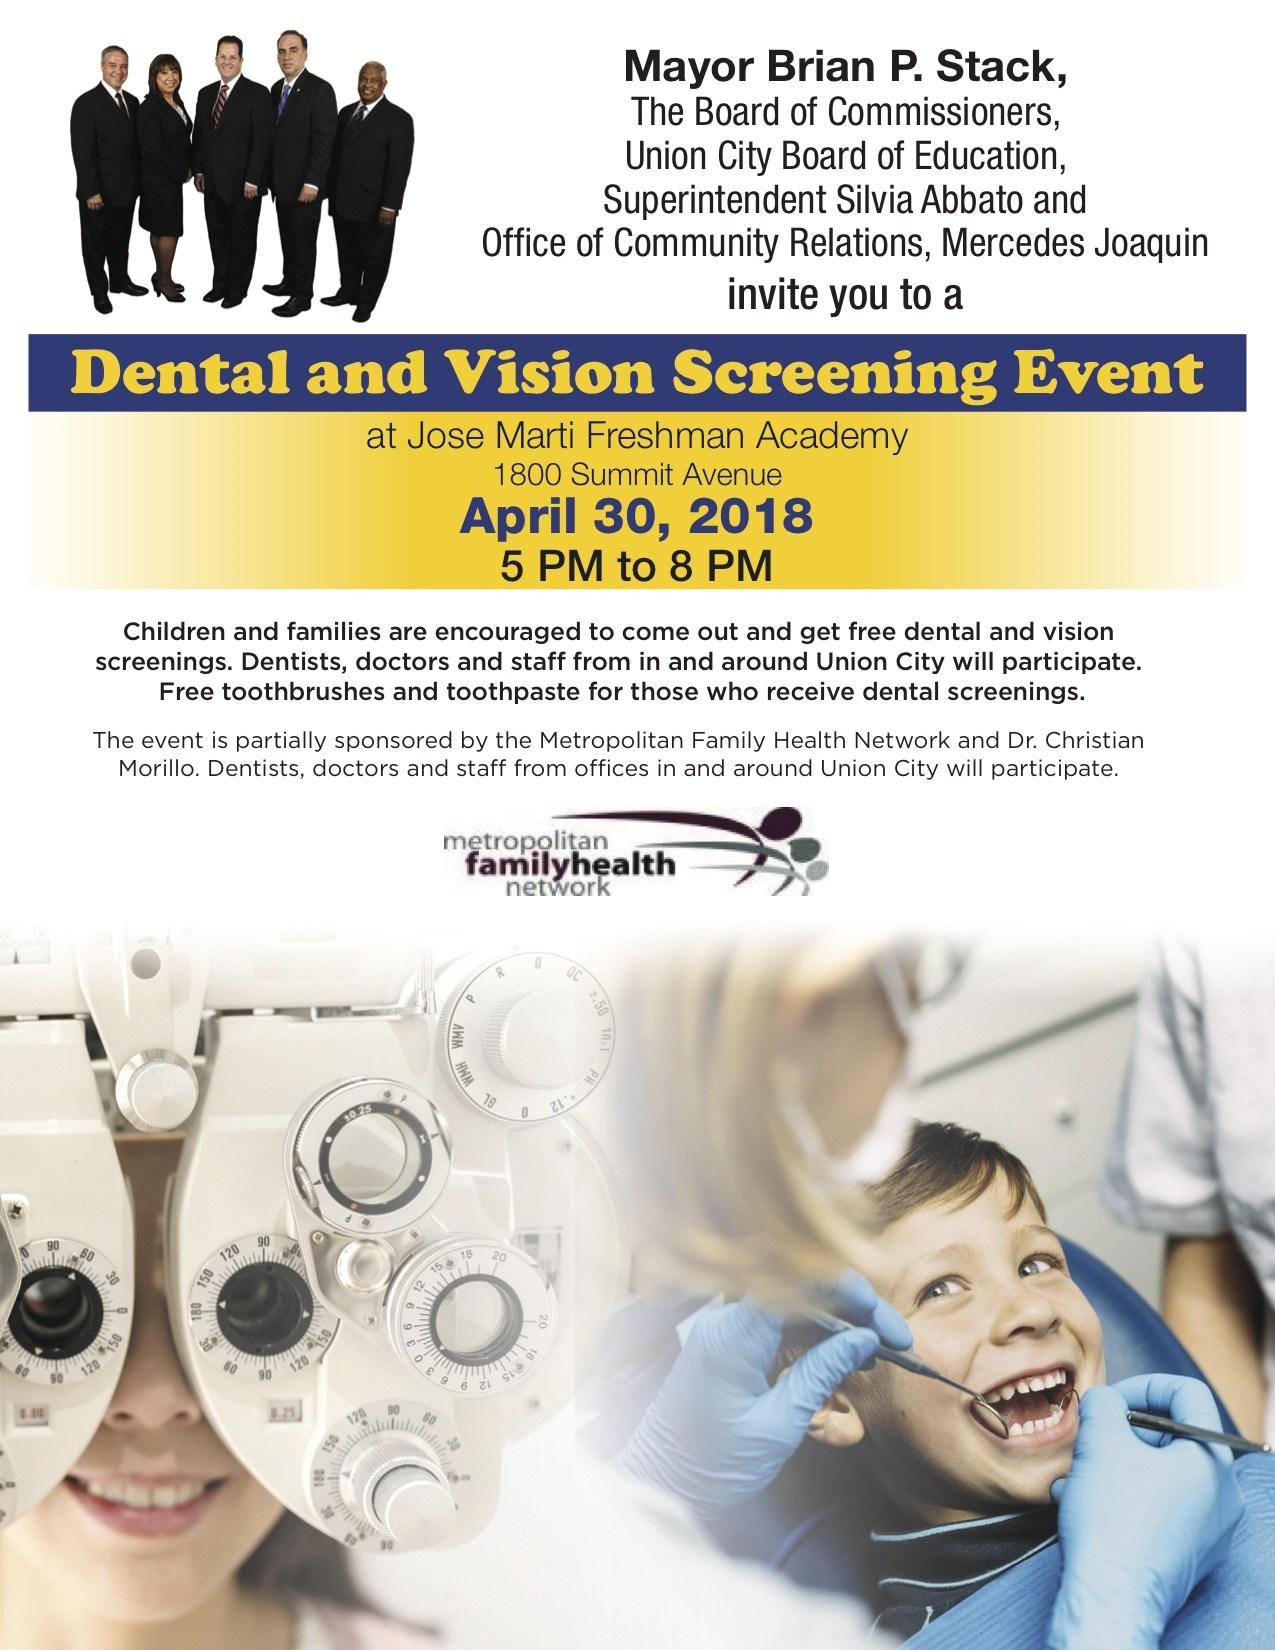 UC Dental & Vision Screening Event flyer